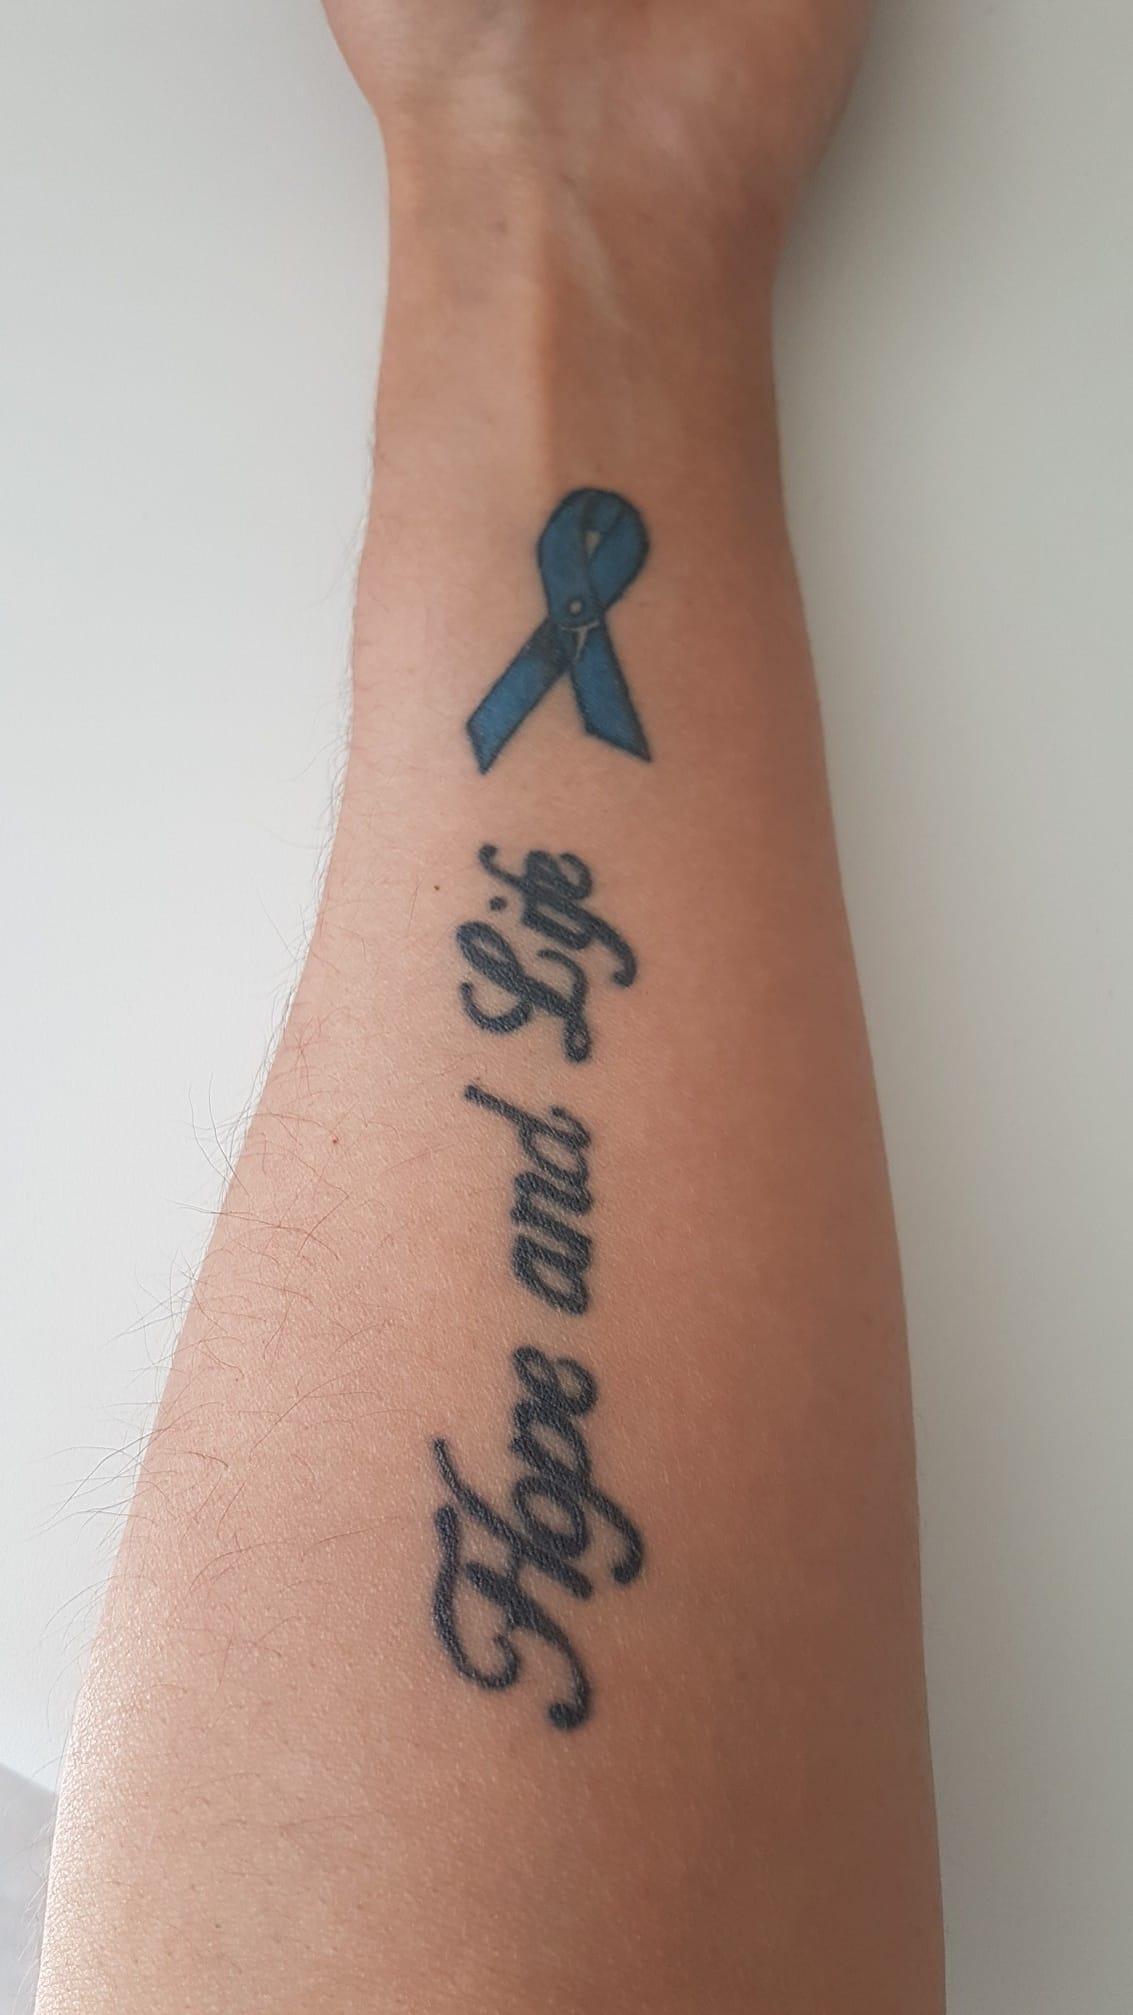 Ruban tatoué